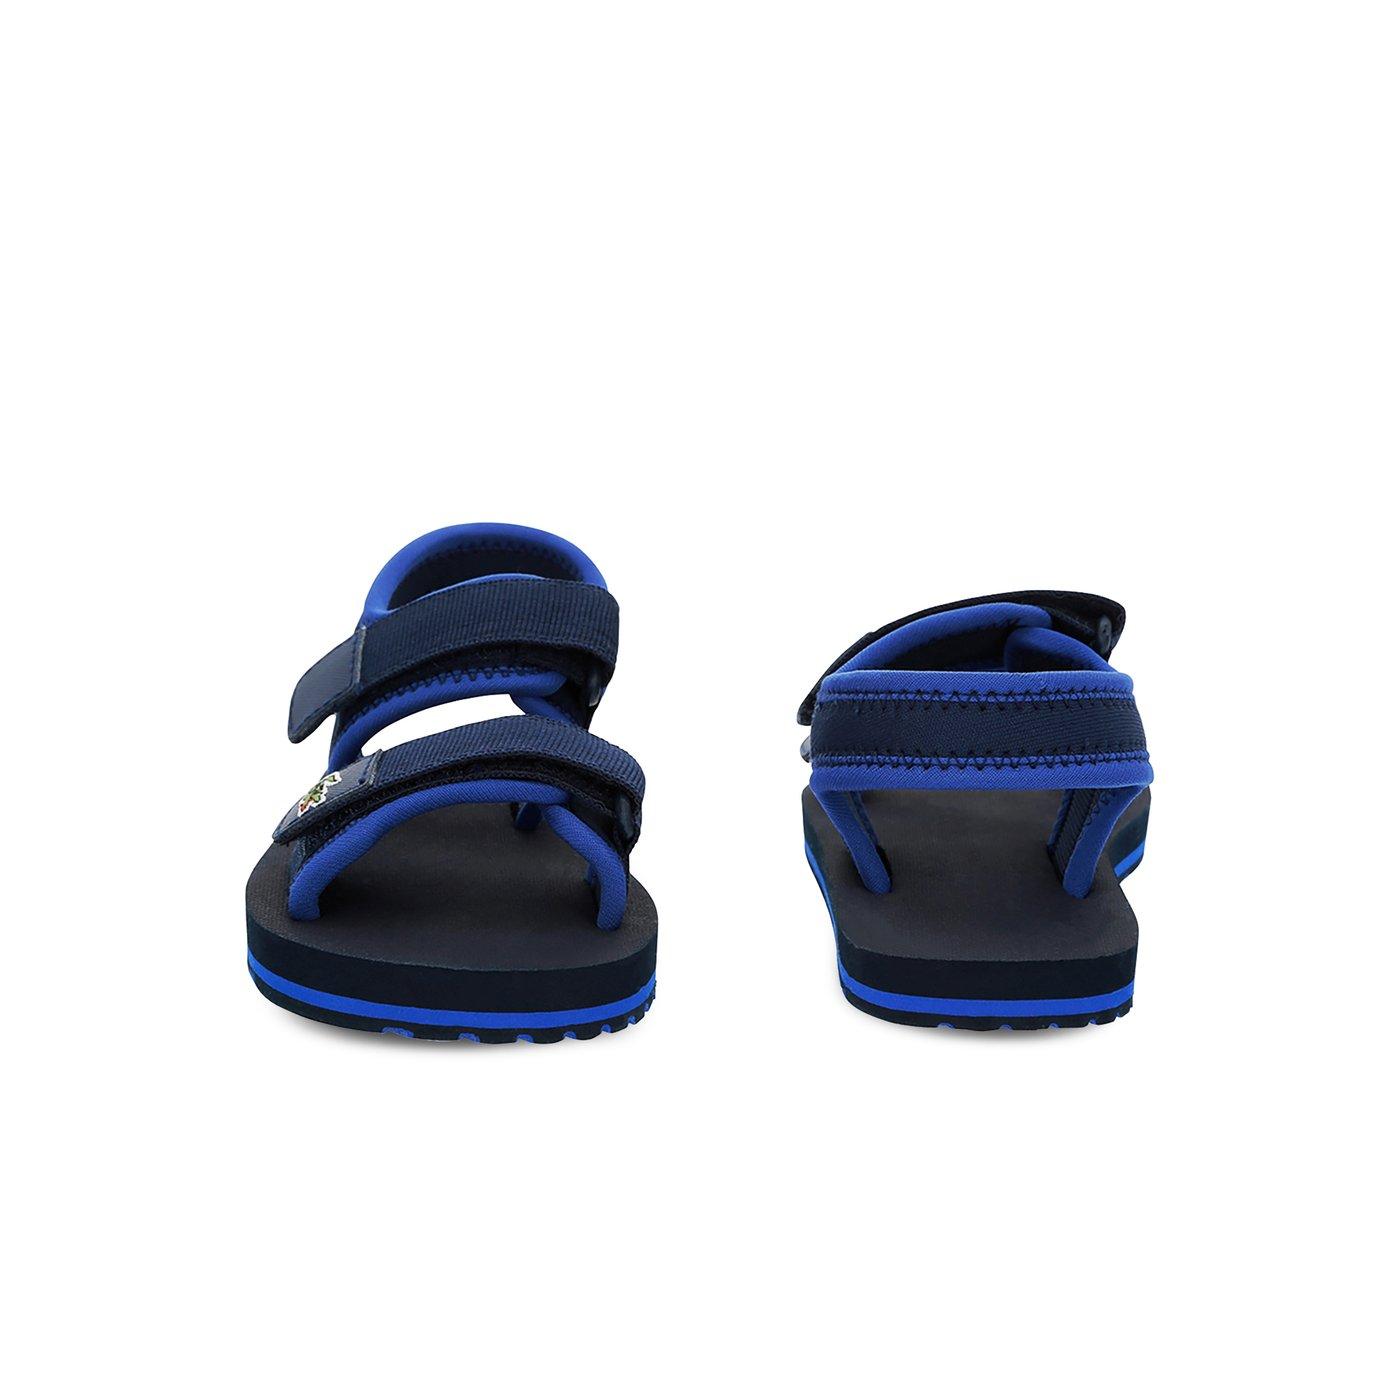 Lacoste Çocuk Lacivert - Mavi 119 1 Sandalet